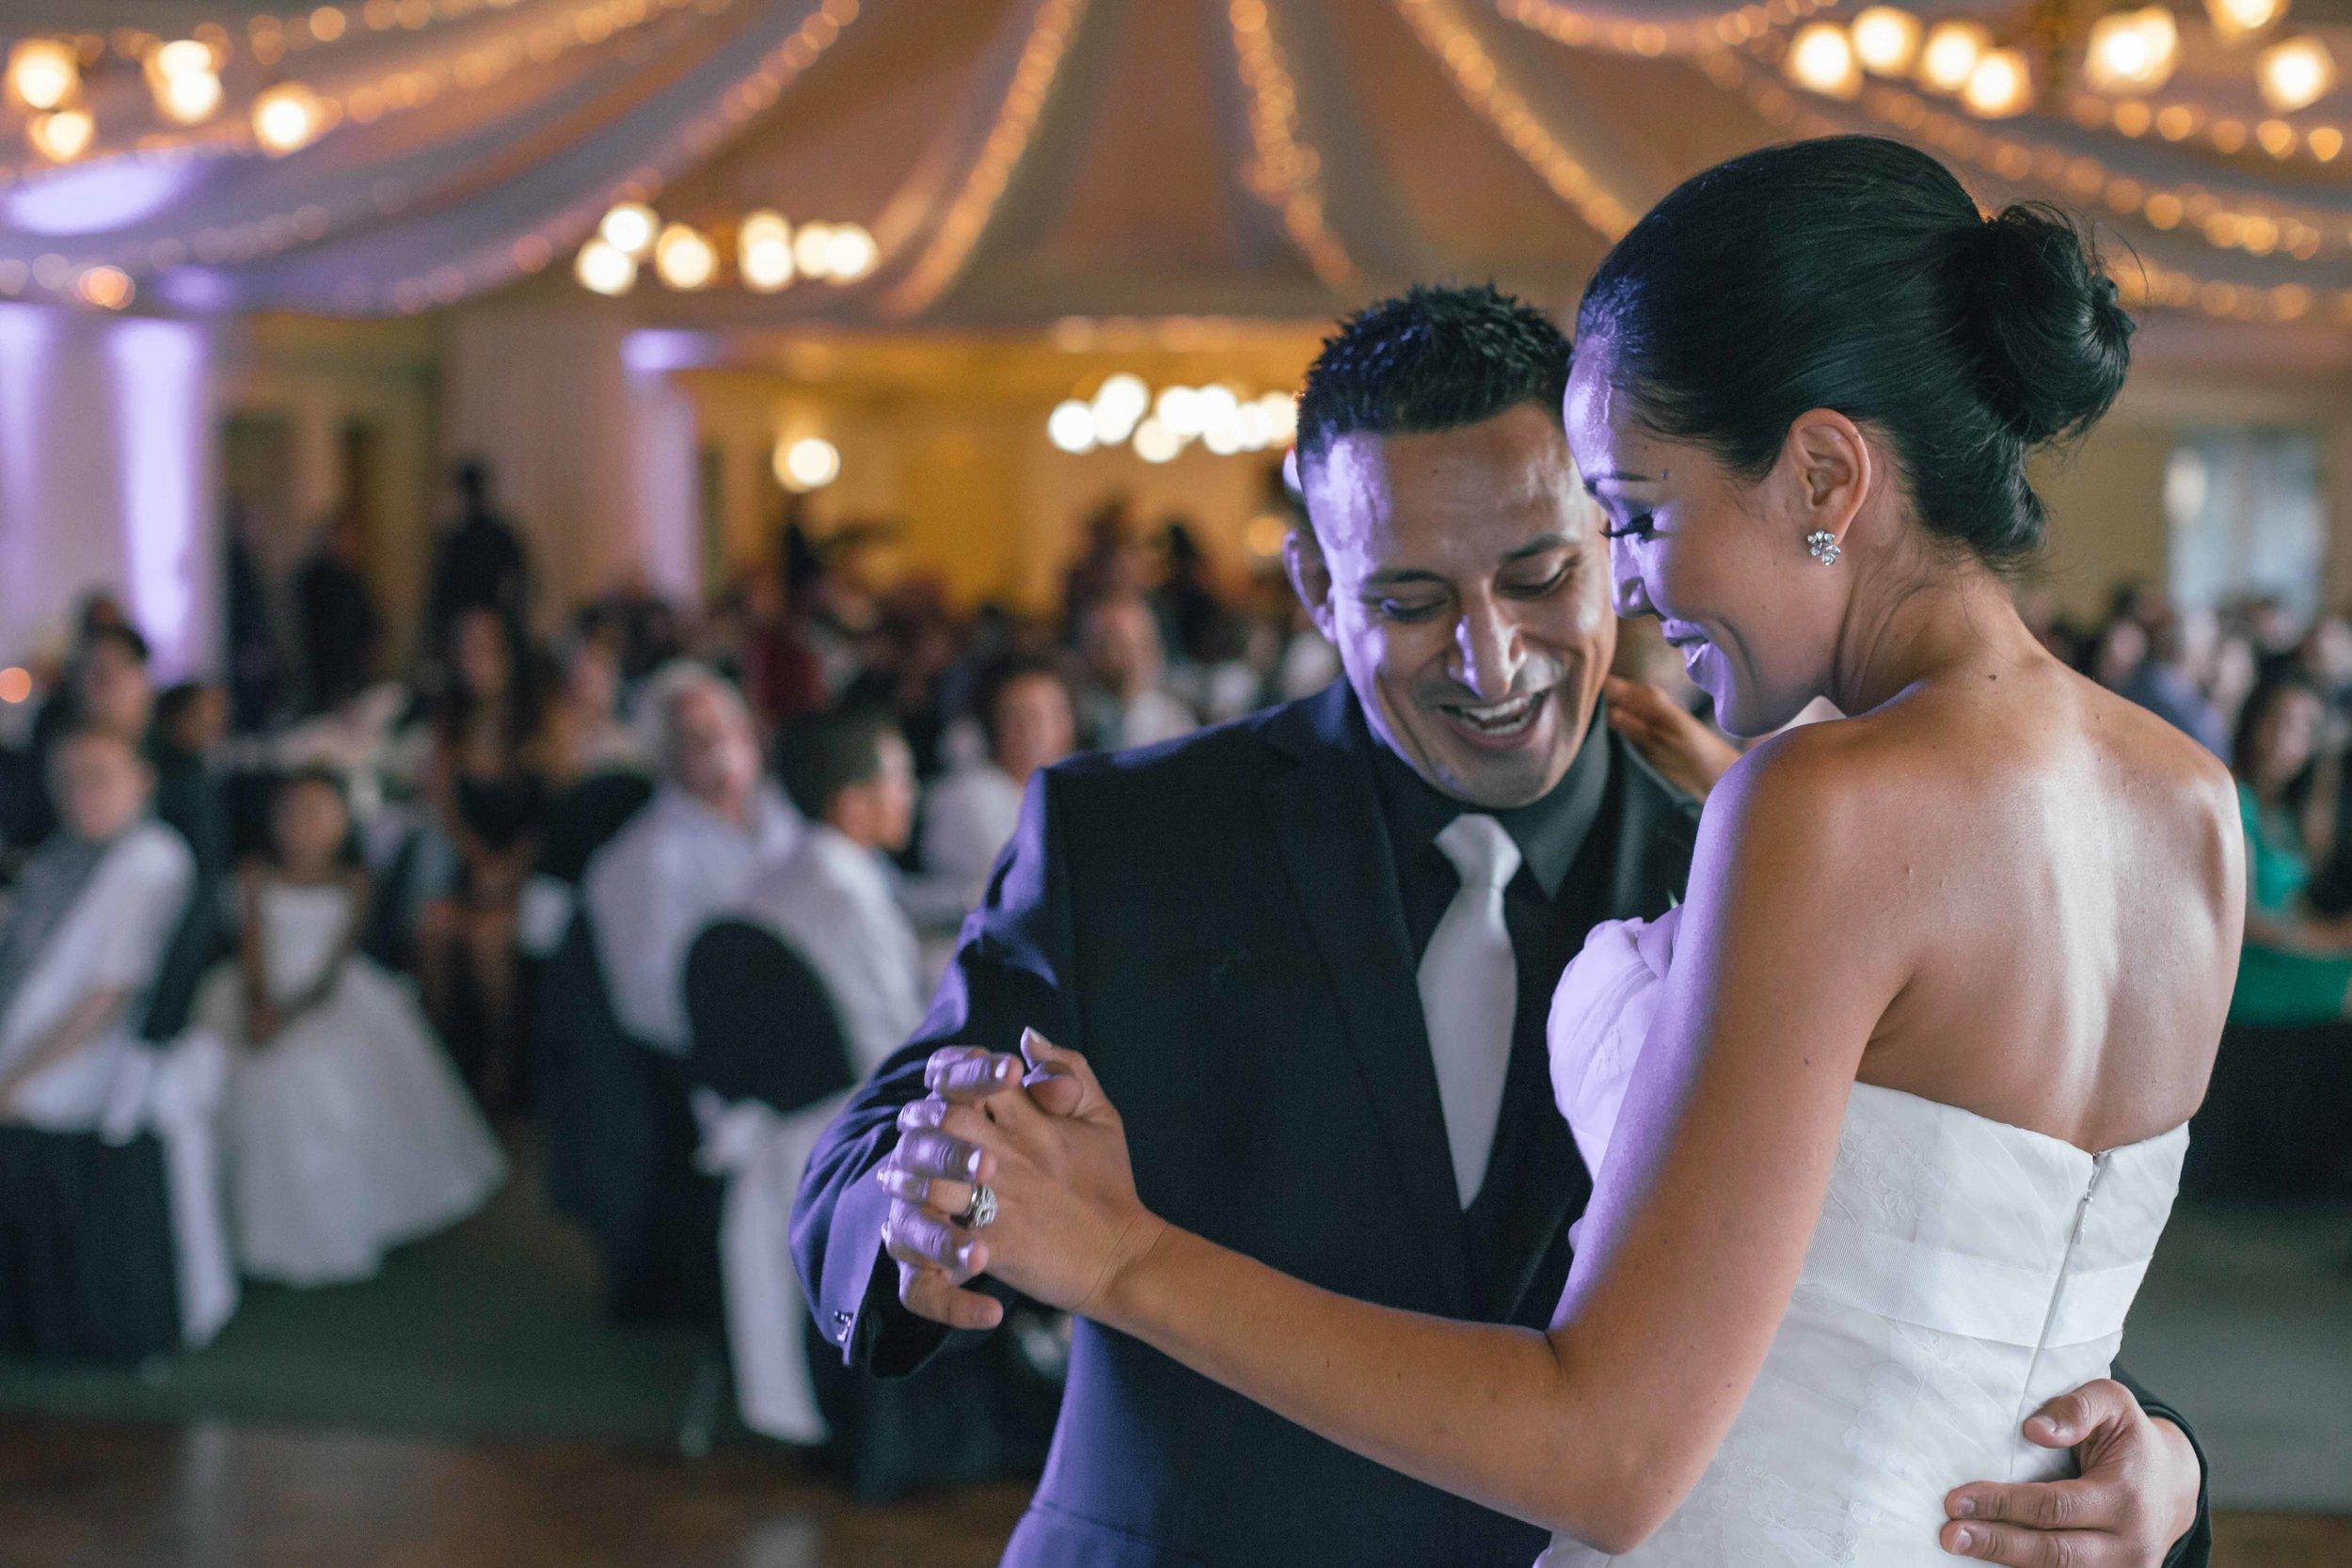 APavone-Photographer-Orange-County-Diamond-Bar-Wedding-079.jpg